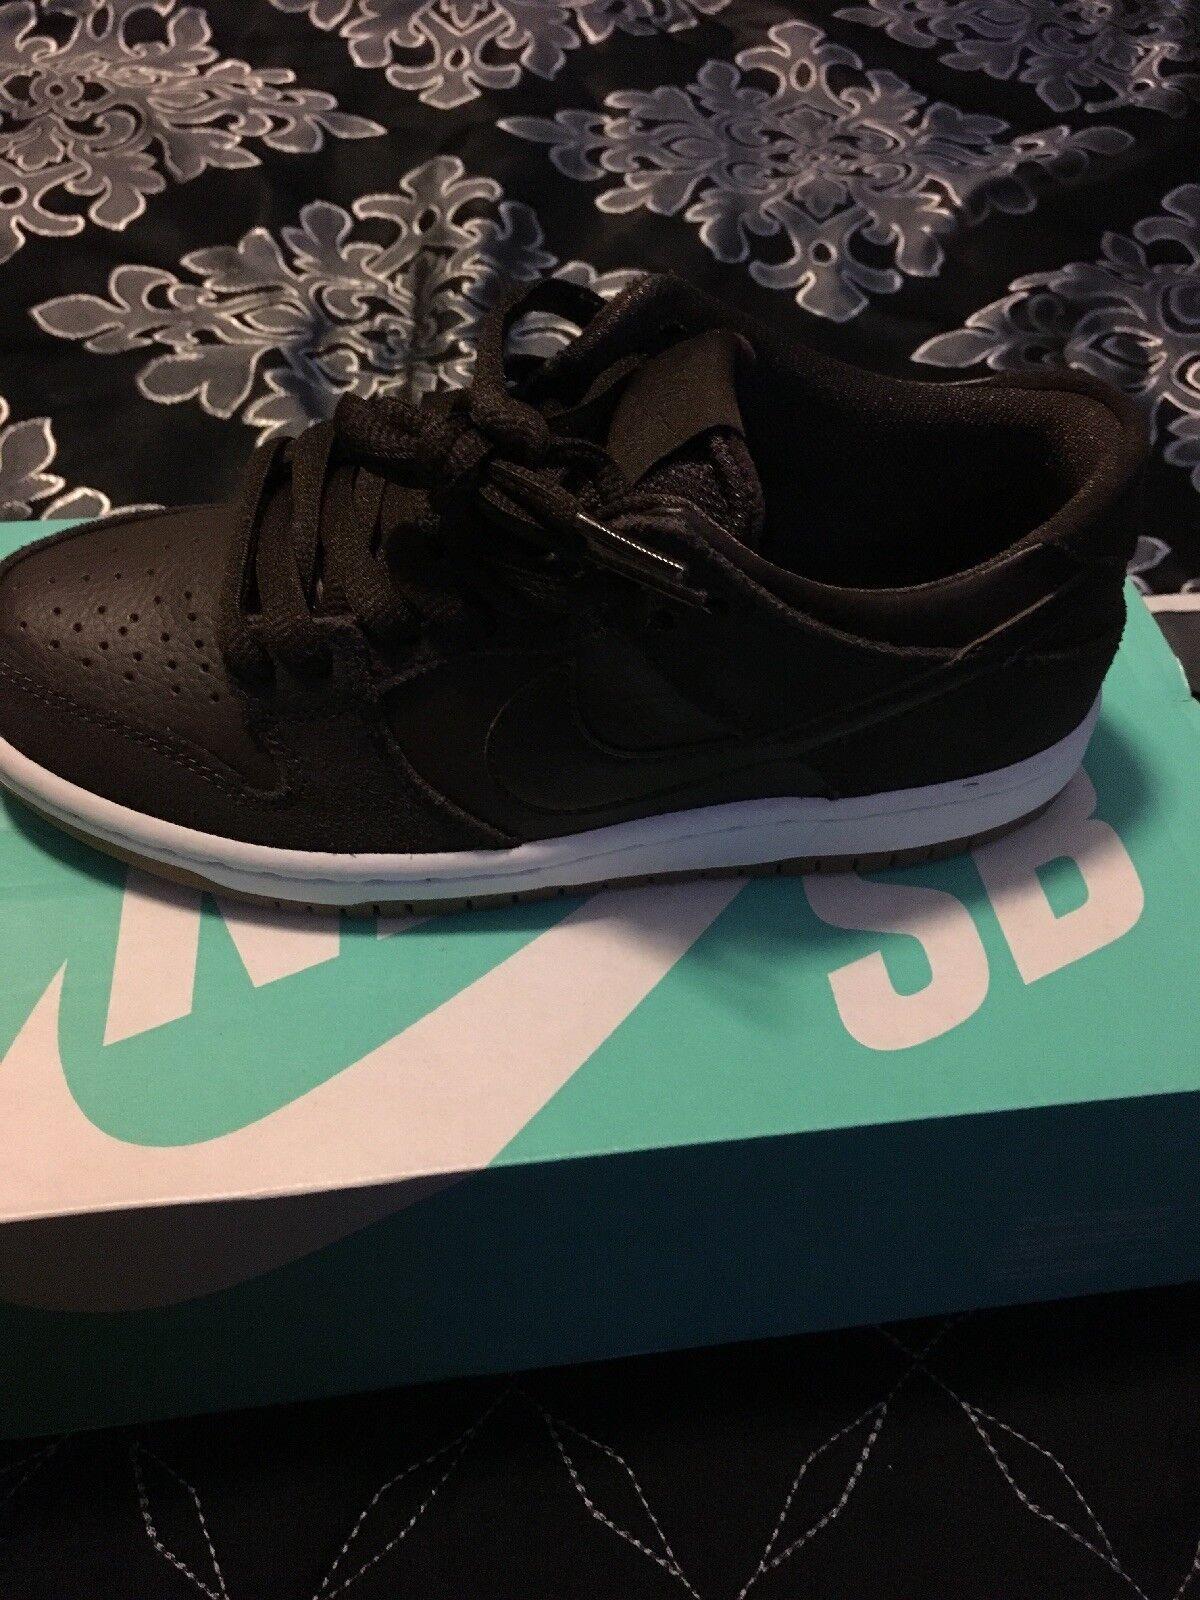 Nike Dunk Low Pro IW IW IW sb Baroque Brown Size 4 fe7aa0